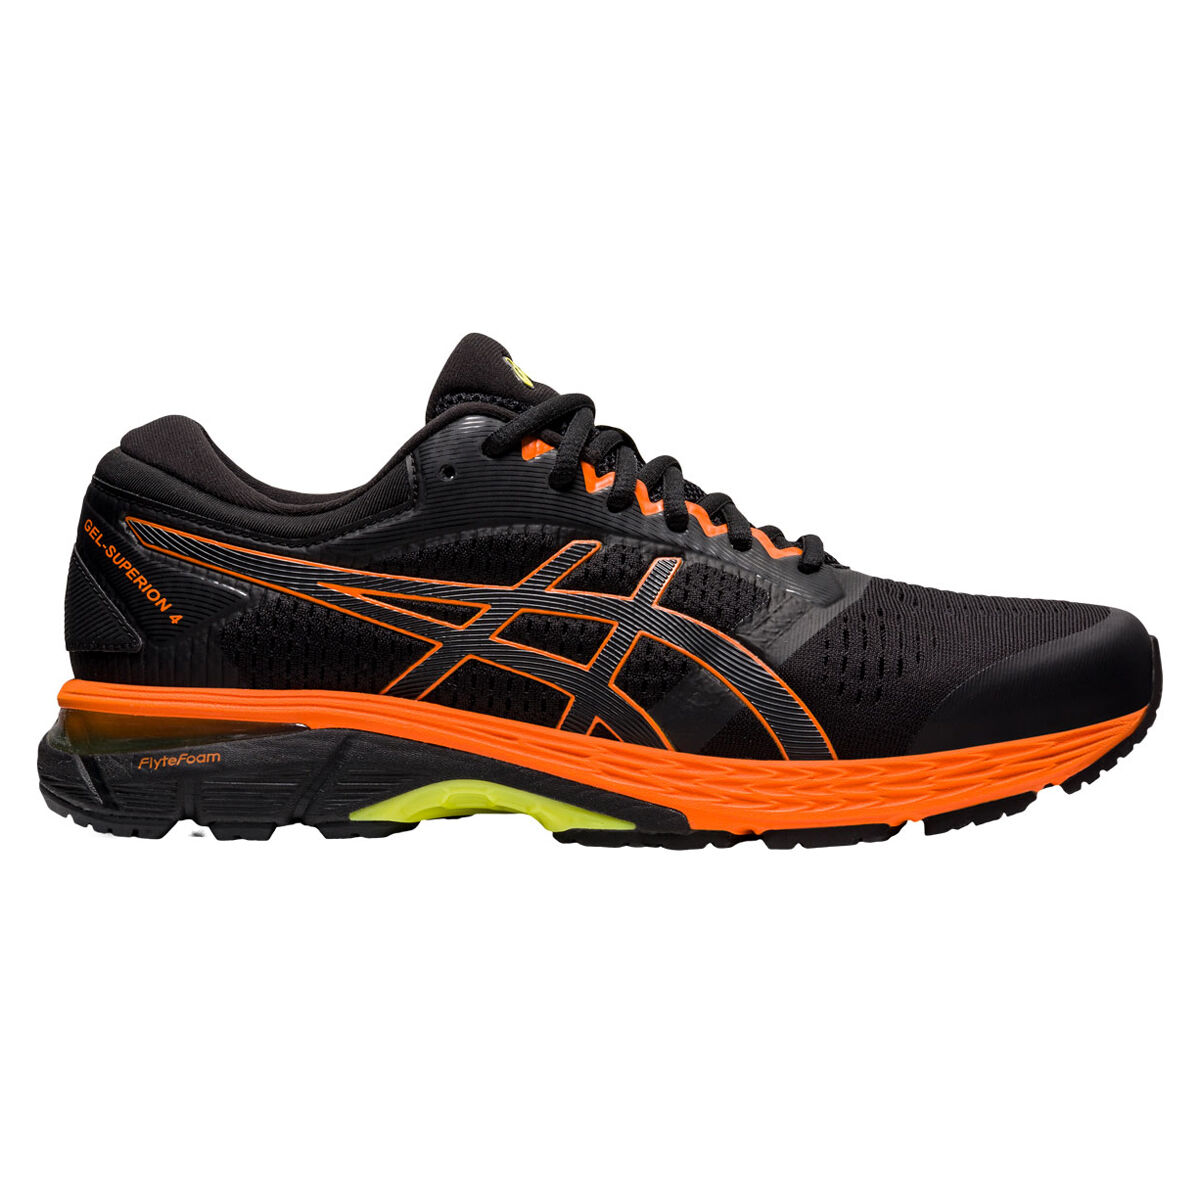 Asics GEL Superion 4 Mens Running Shoes | Parfaire Sport